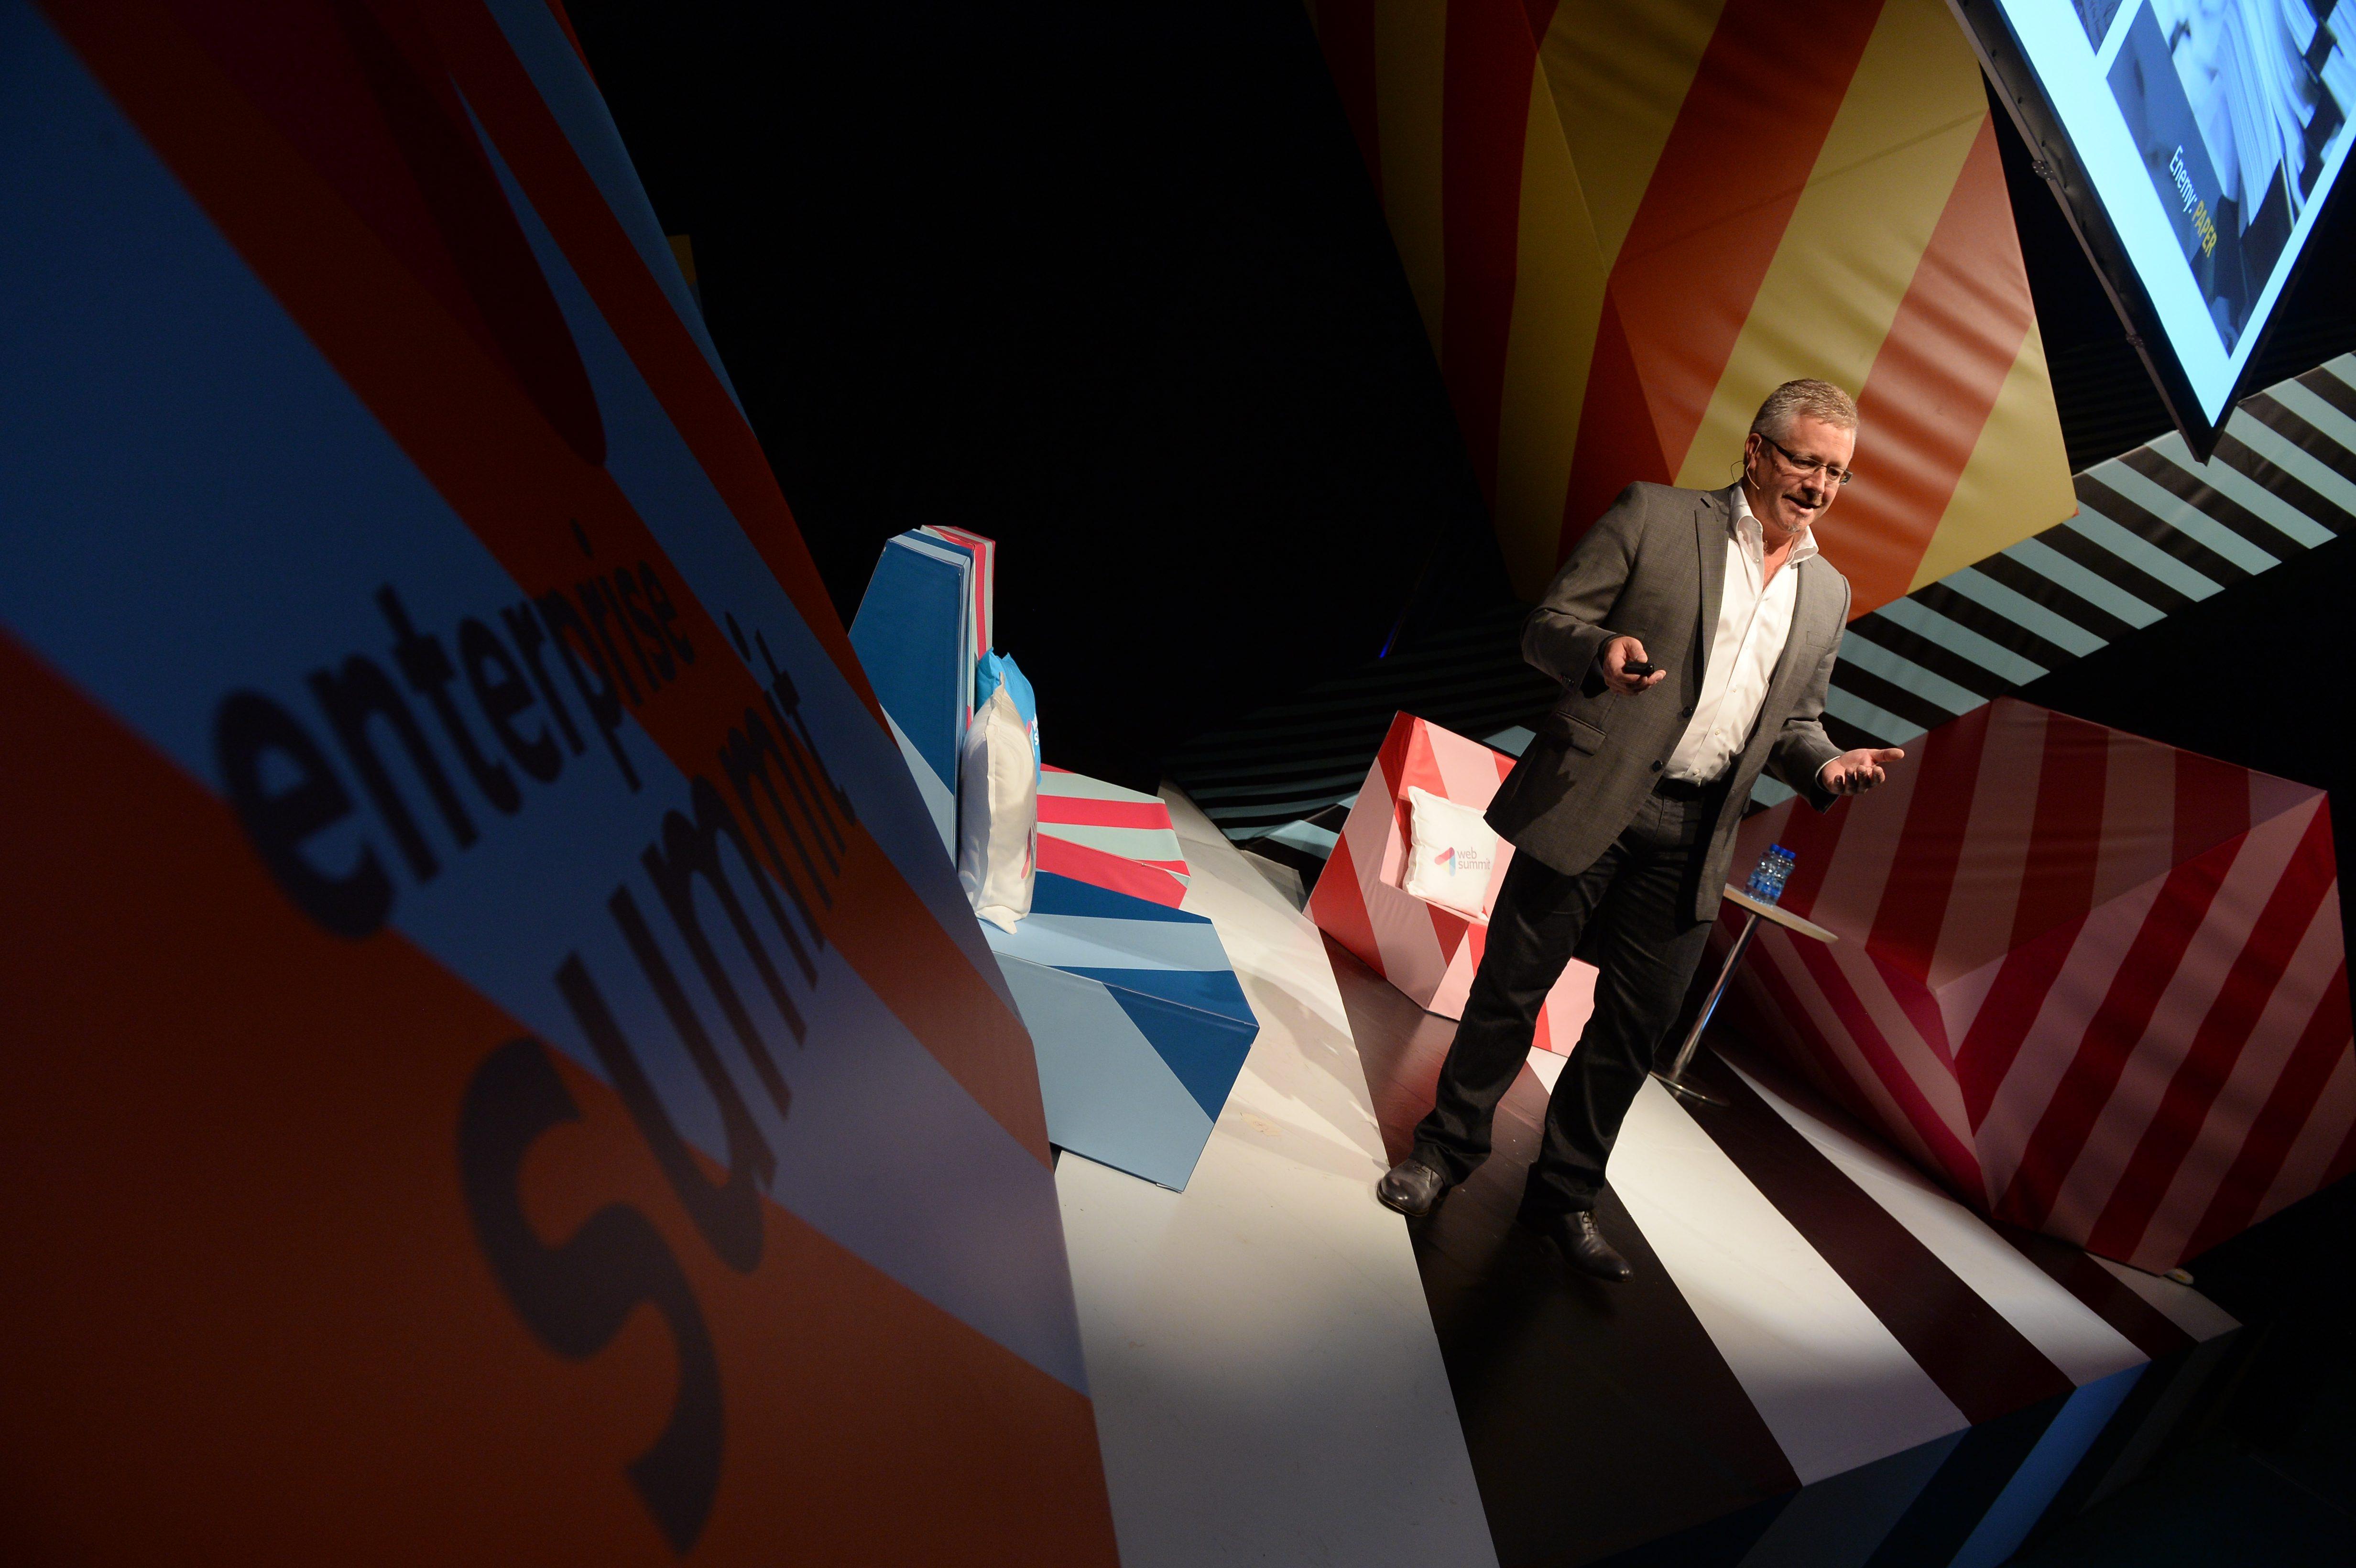 2014 Web Summit - Day 2 - Enterprise Stage